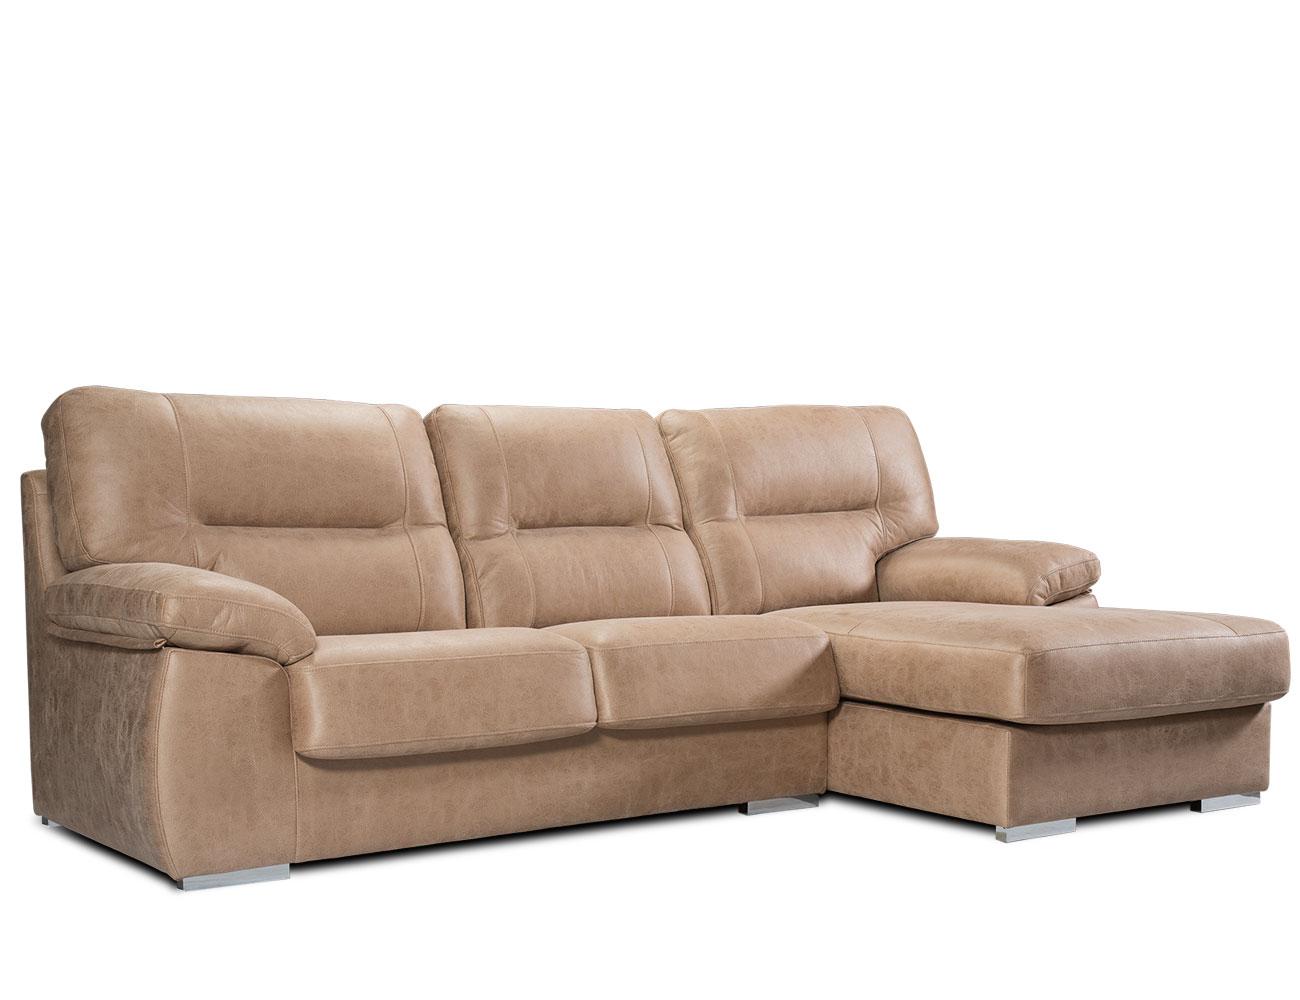 Sofa chaiselongue anti manchas 2